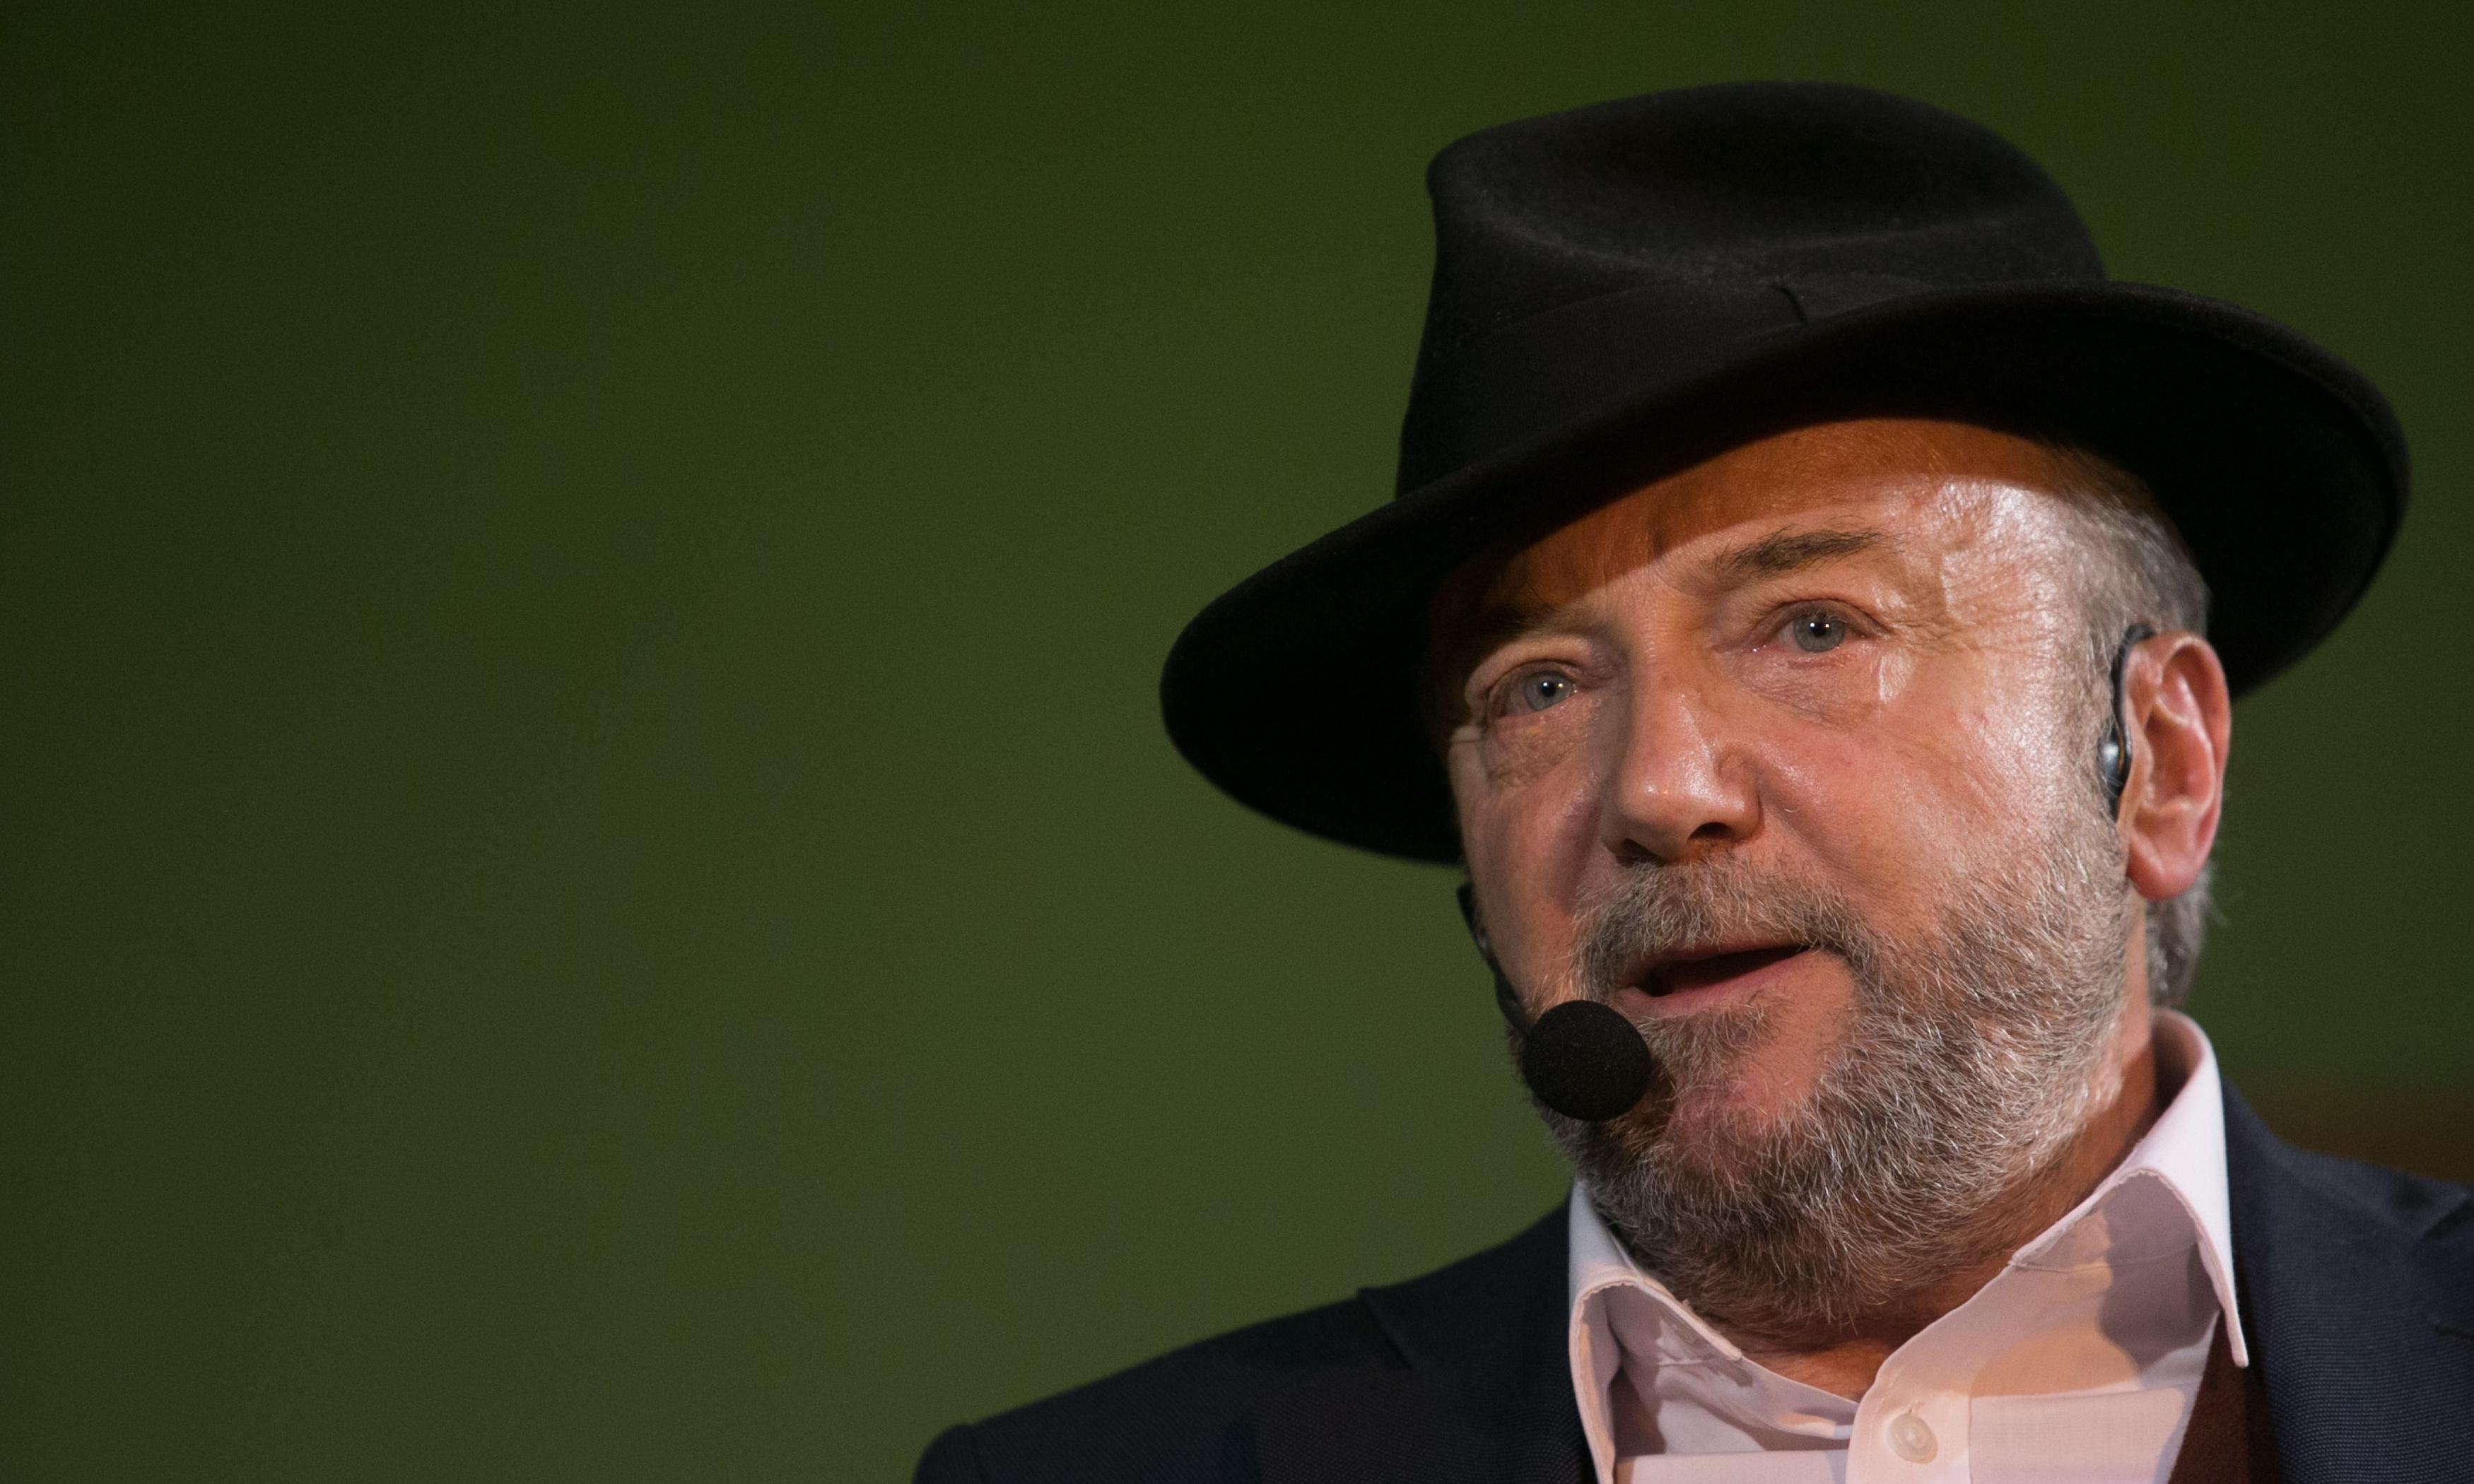 Rupert Murdoch's talkRadio argued it had very few listeners to avoid fine